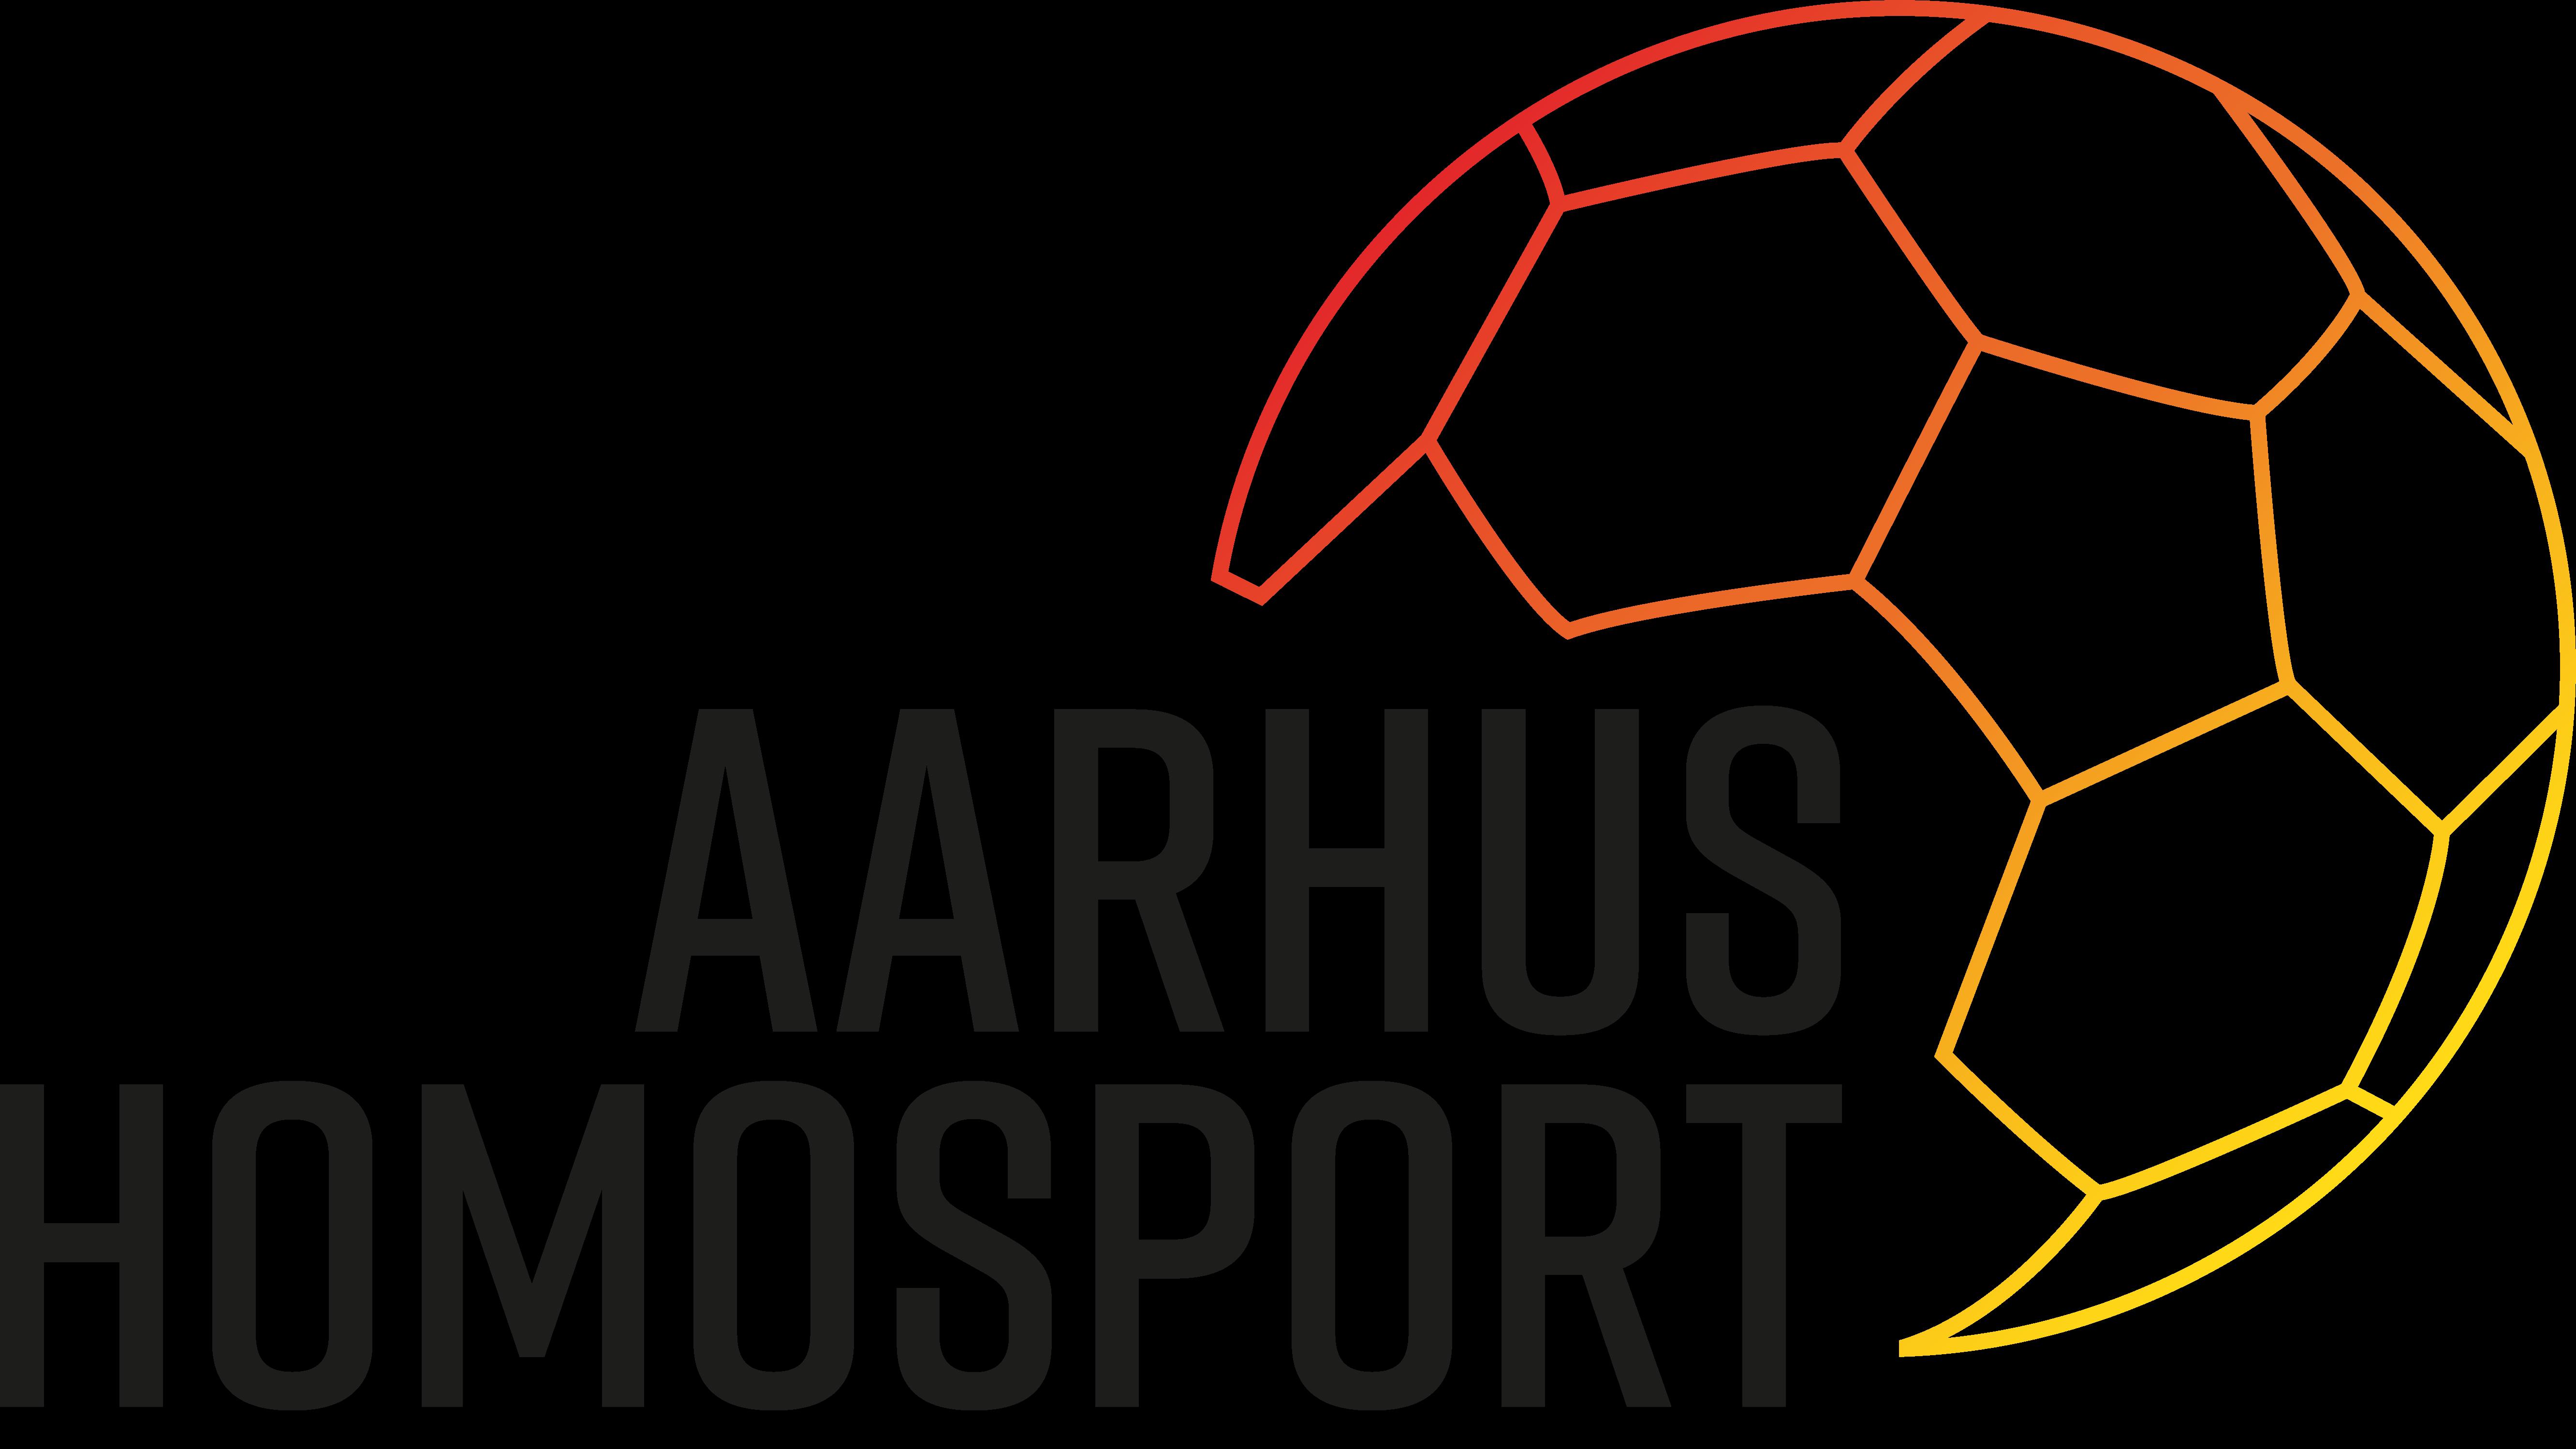 Aarhus Homosport logo